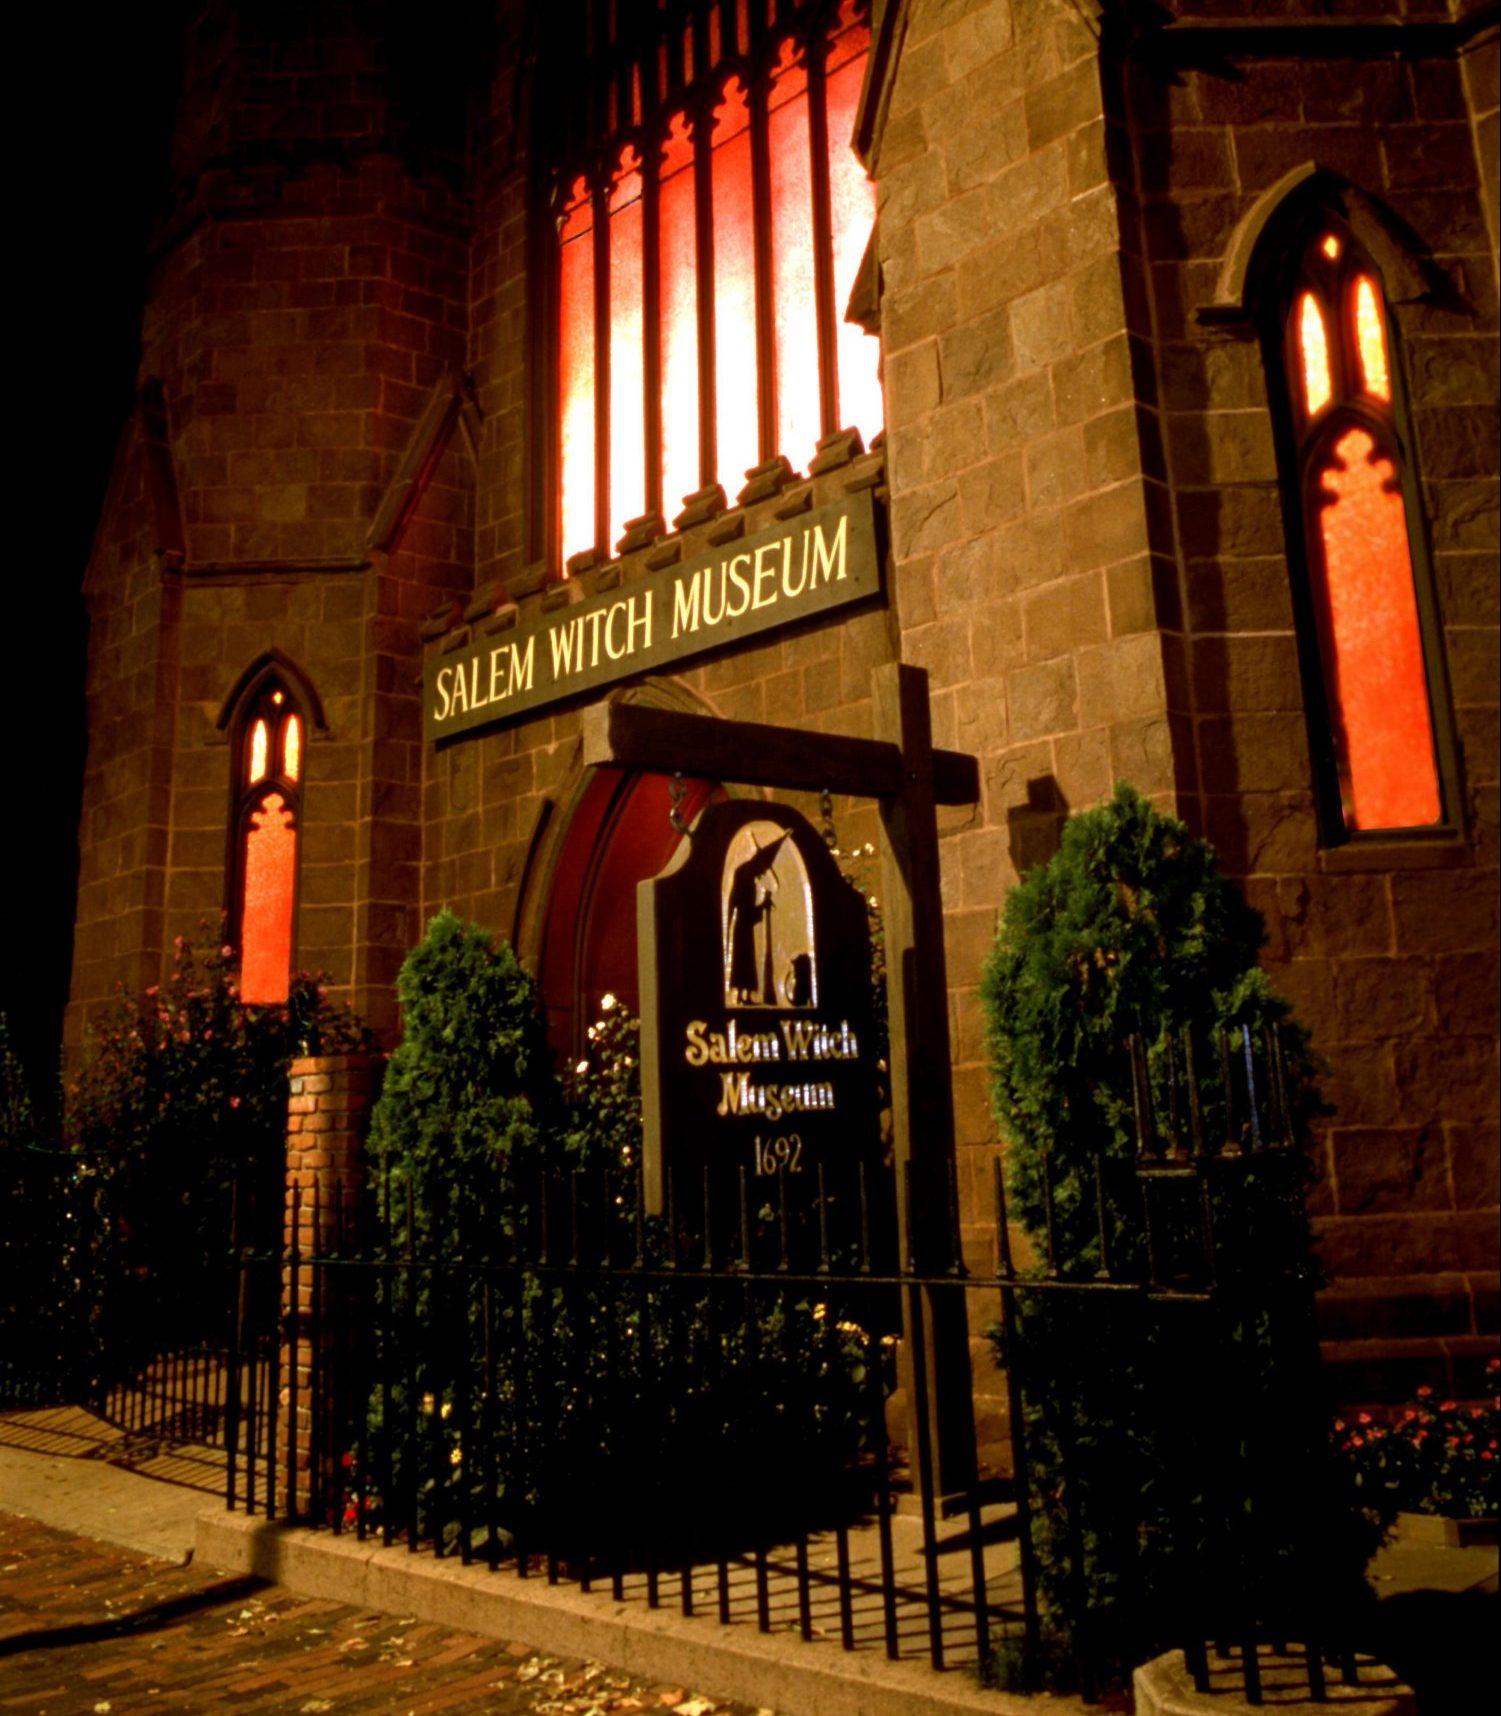 Salem witch museum part of Haunted Happenings in Salem Massachusetts